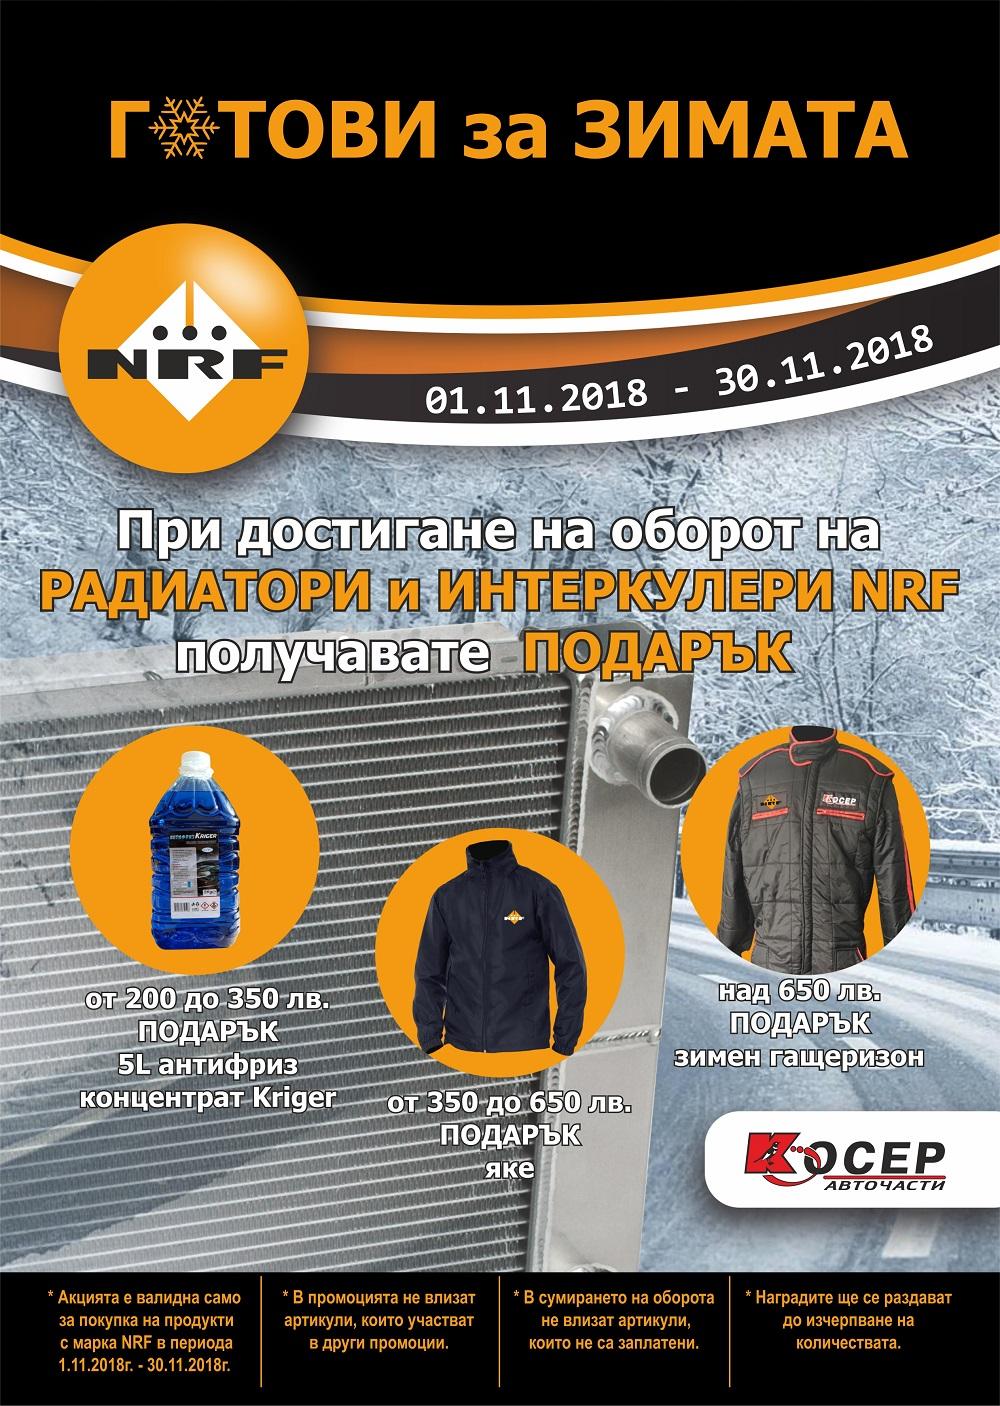 Промоция NRF, 01.11.2018 - 30.11.2018